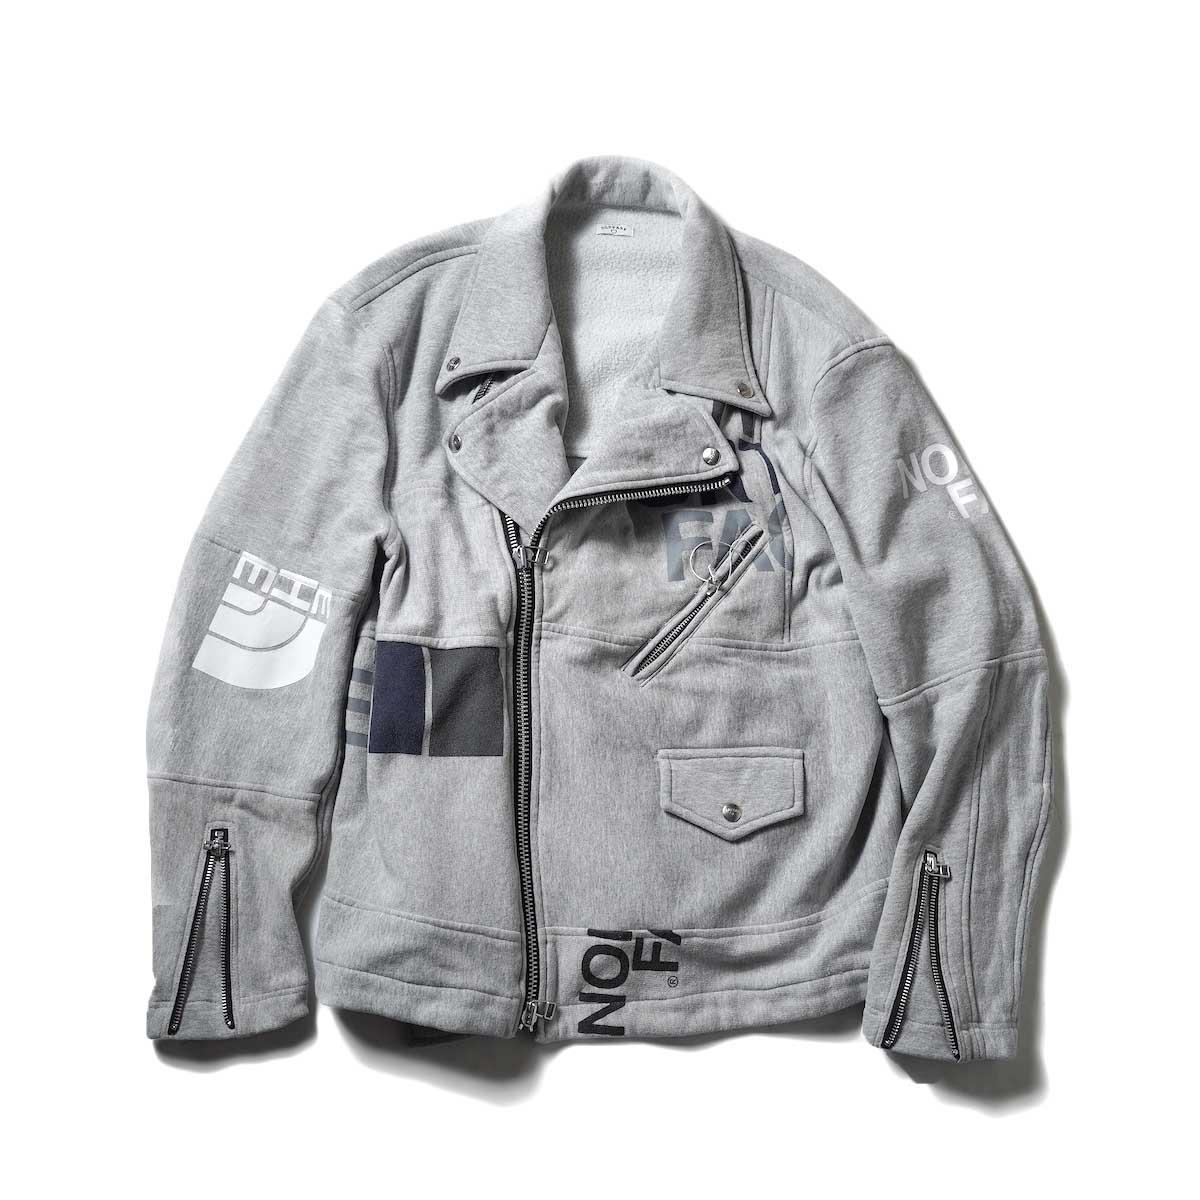 OLD PARK / Oversized Riders Jacket -Sweat